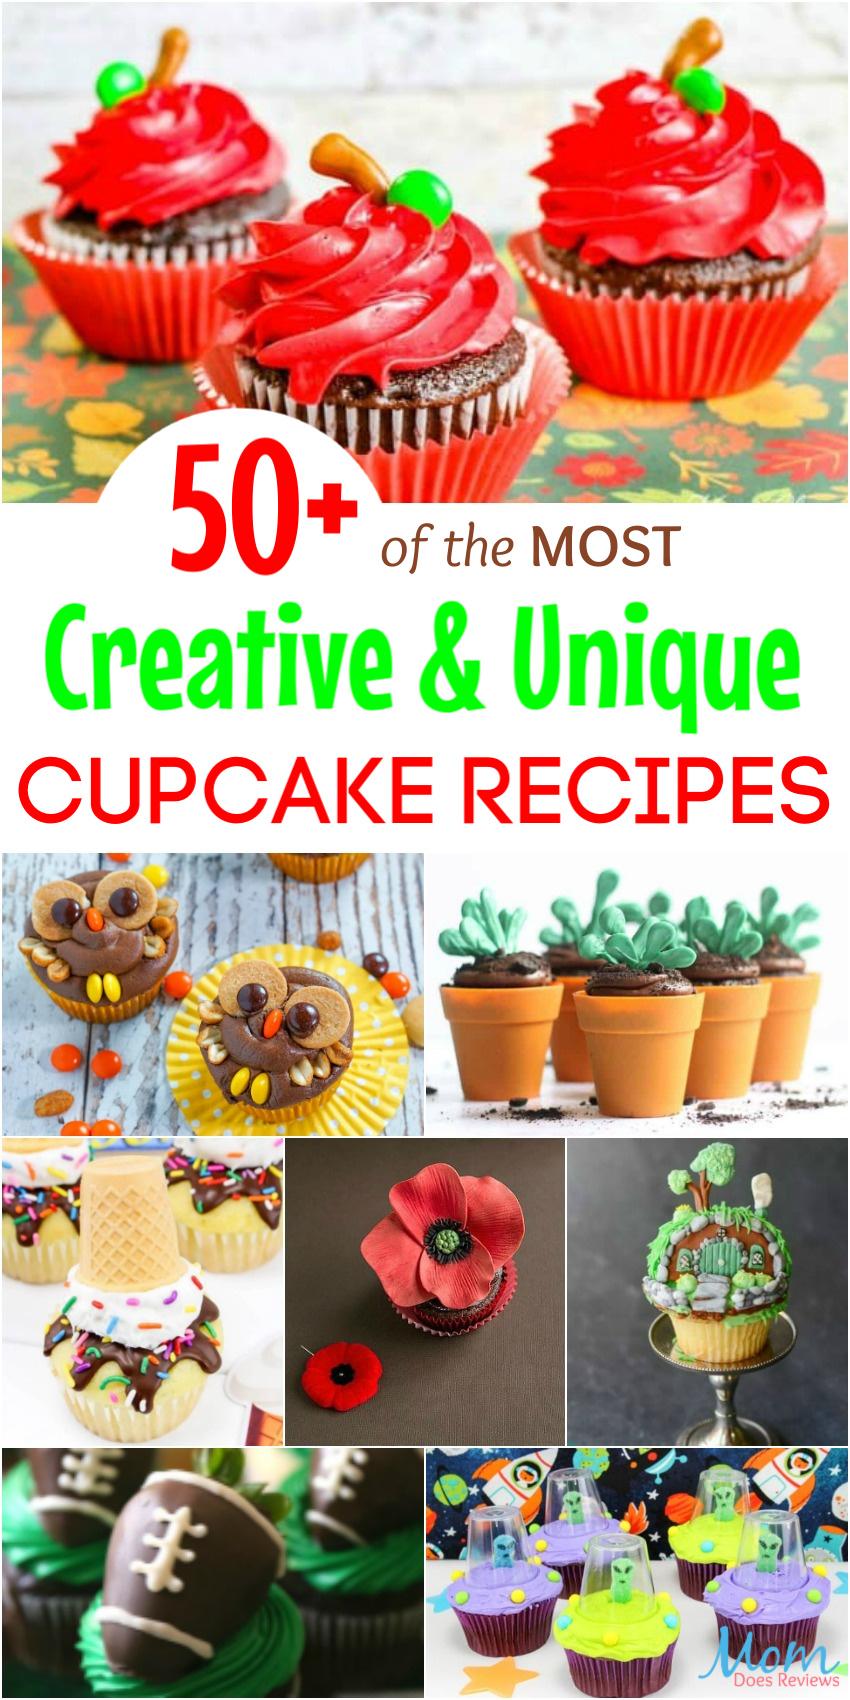 50+ of the MOST Creative & Unique Cupcake Recipes Around